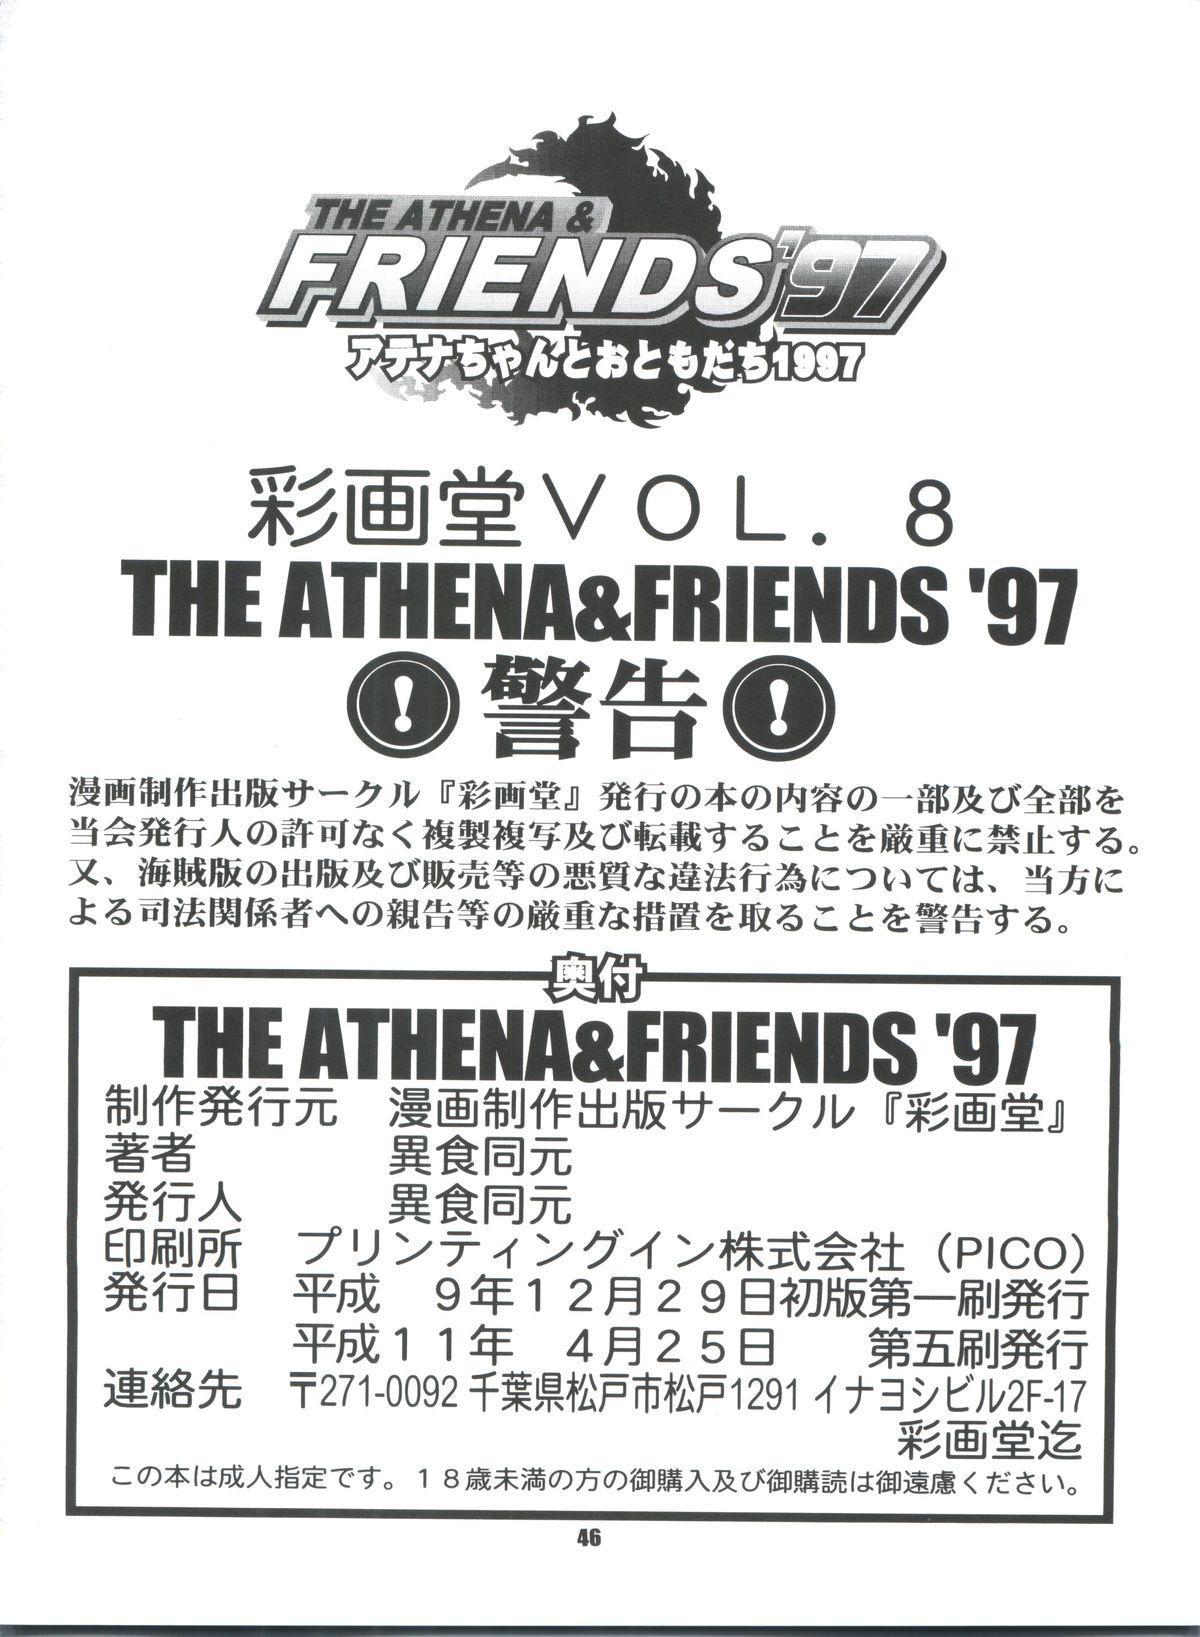 The Athena & Friends '97 44